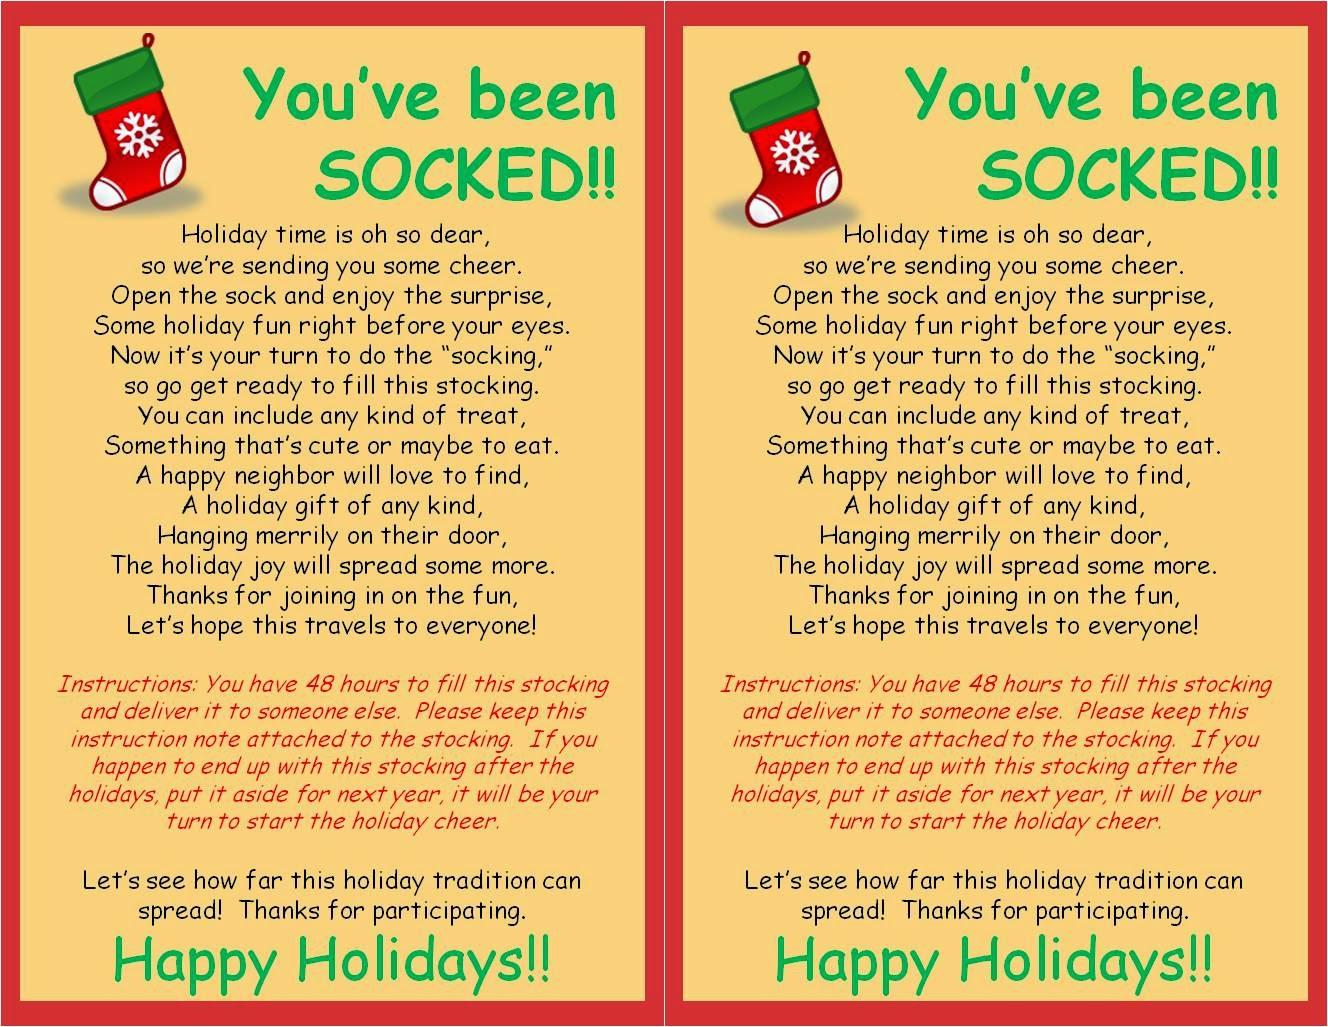 Strong Armor: Christmas Socking - You Ve Been Socked Free Printable